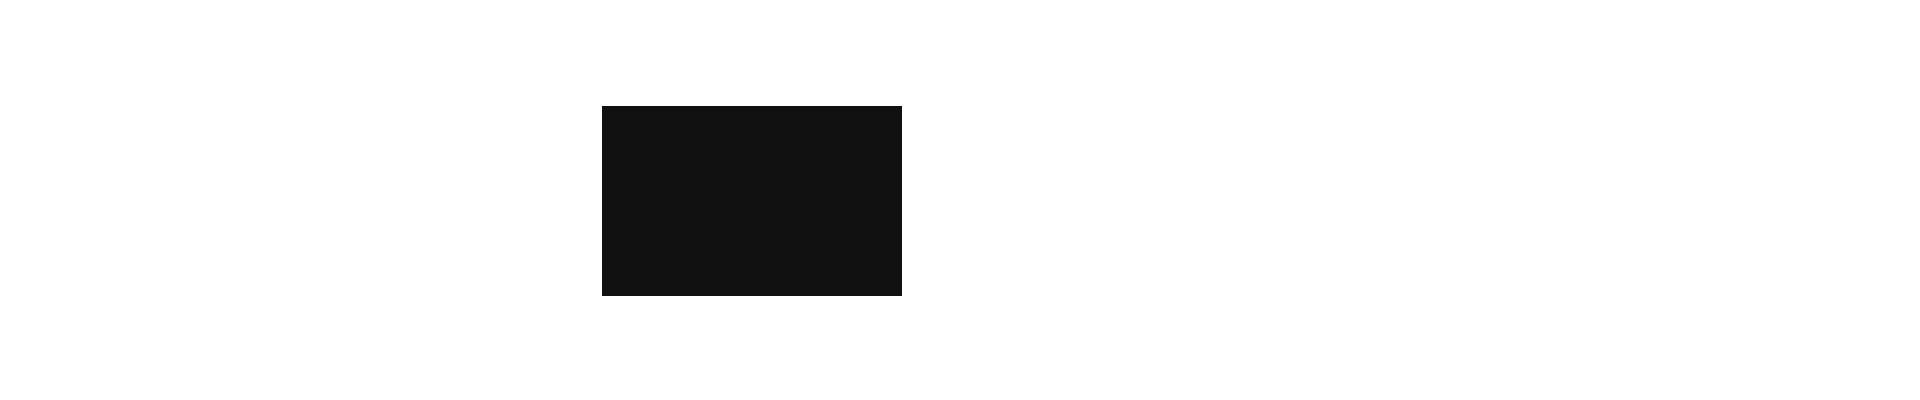 banner_flow_text